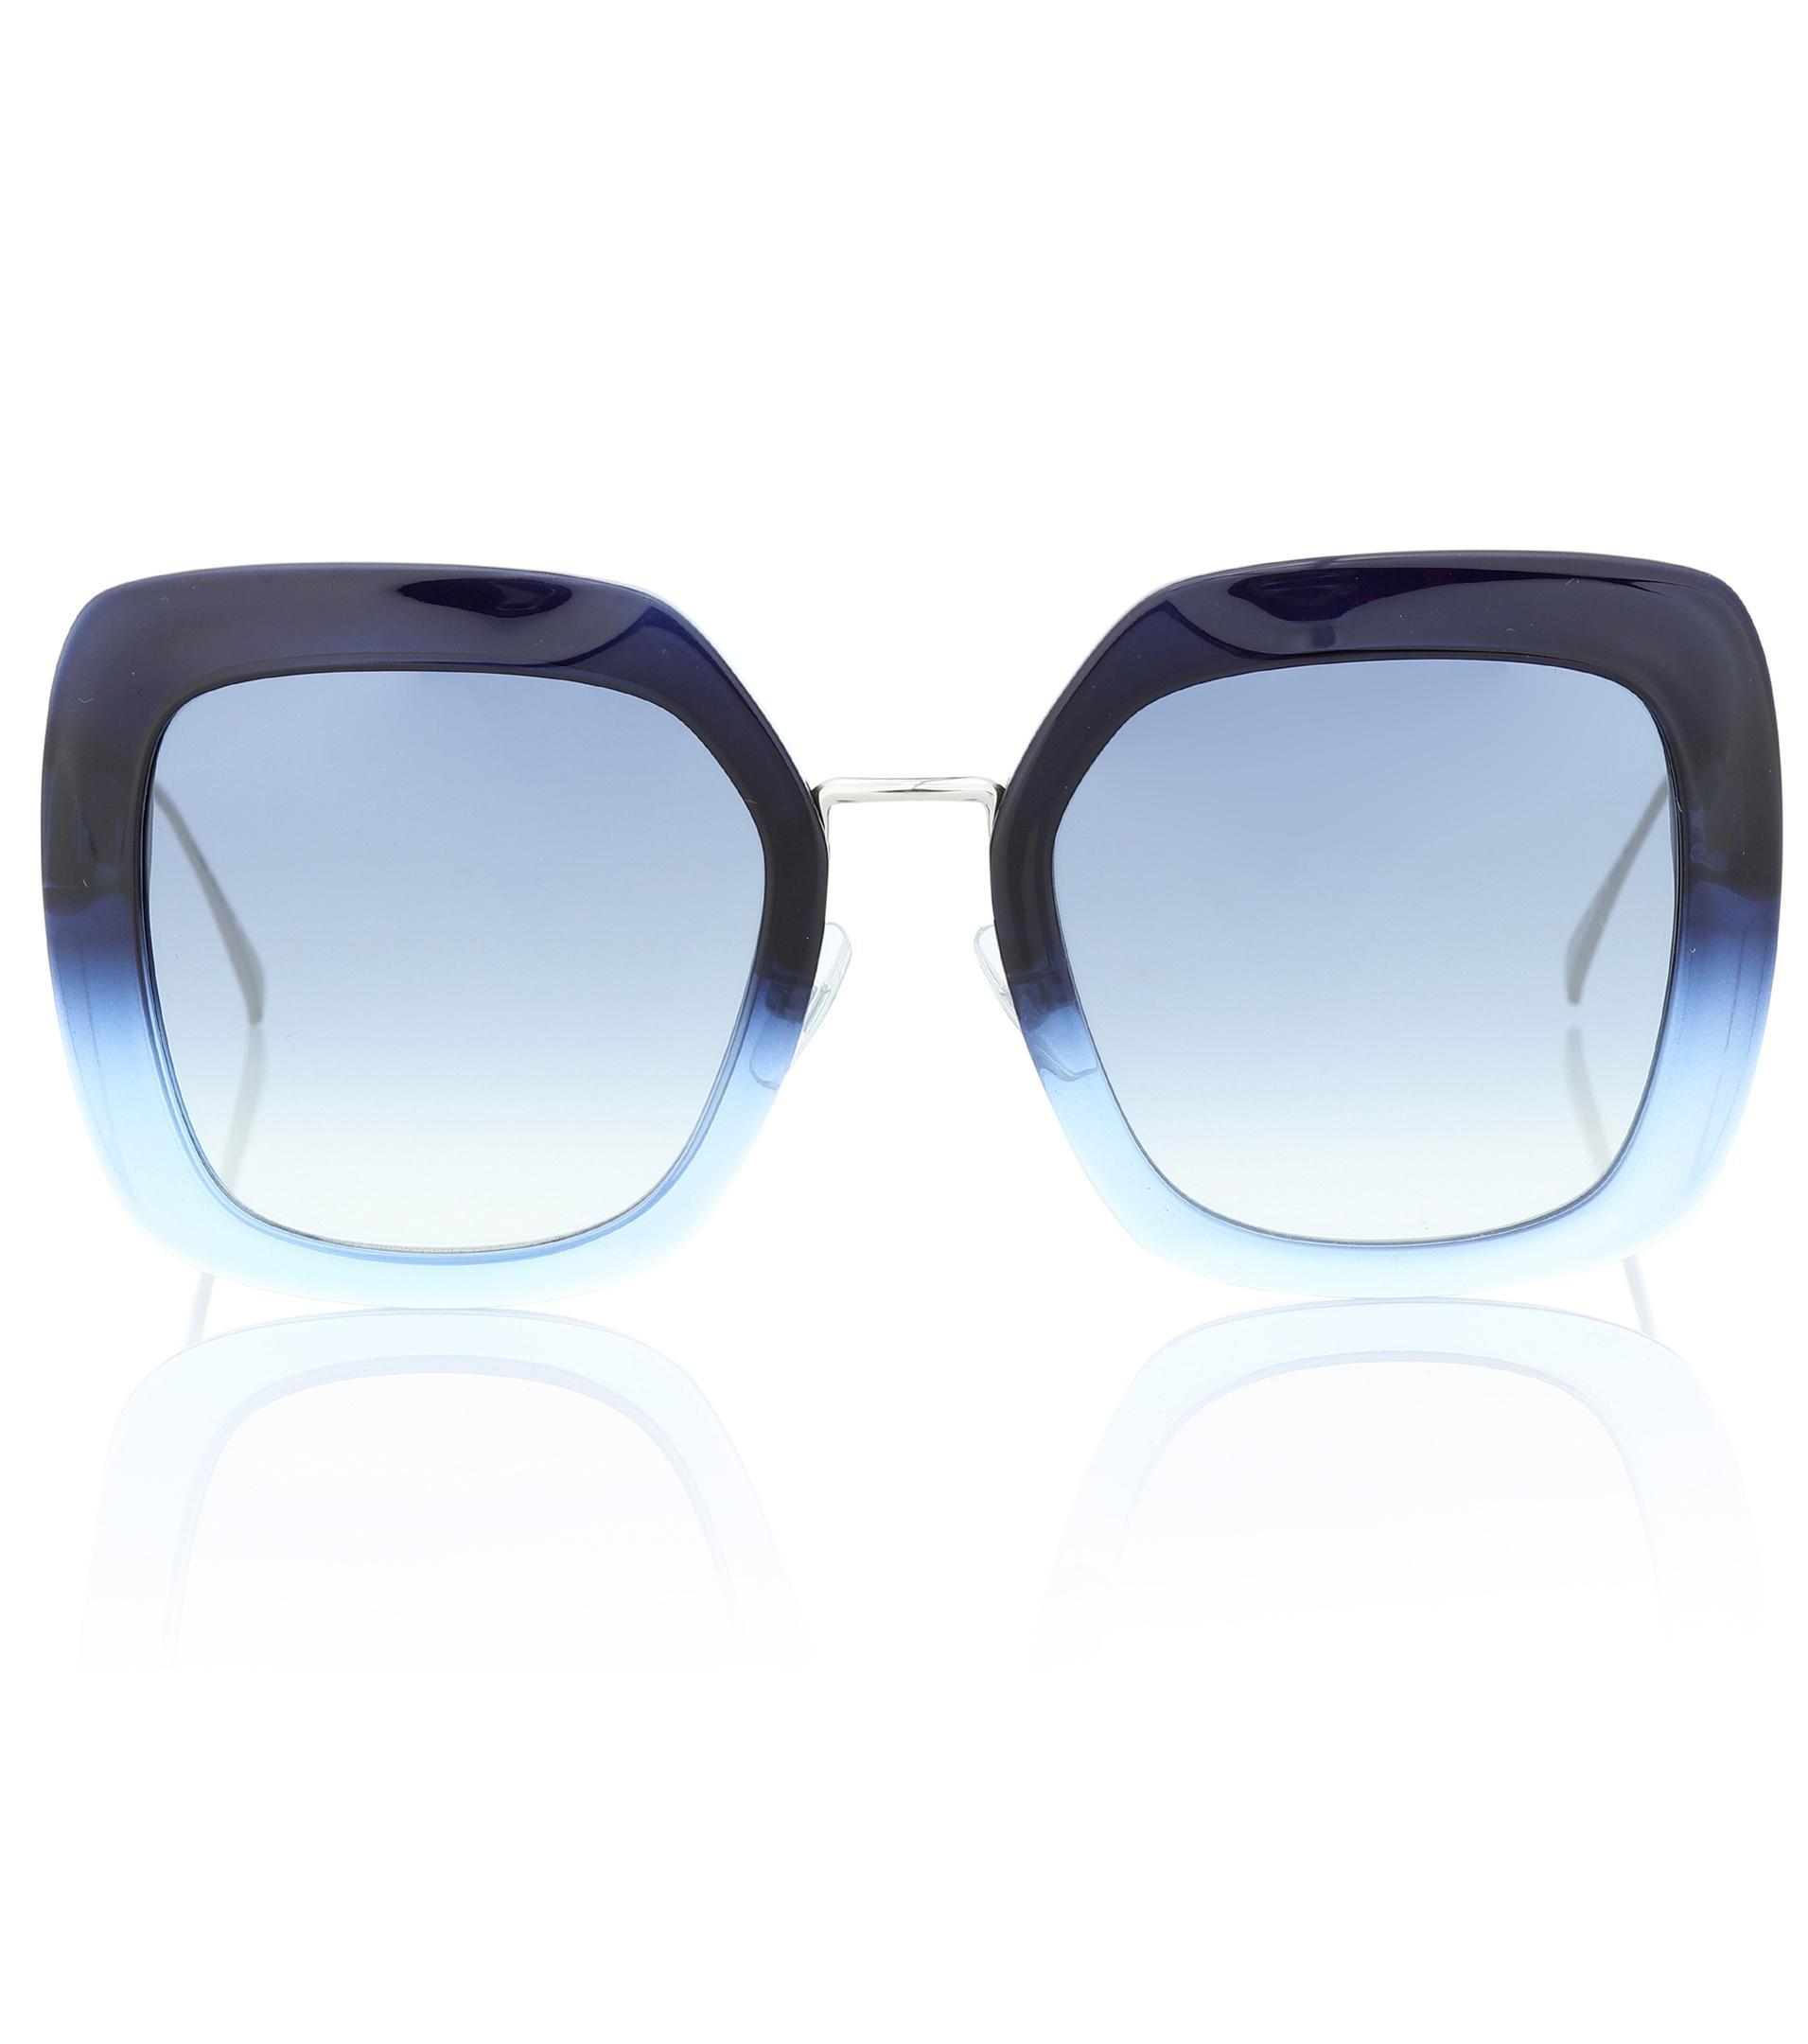 Blue In Shine Lyst Sunglasses Fendi Square Tropical ICXwx0qfq